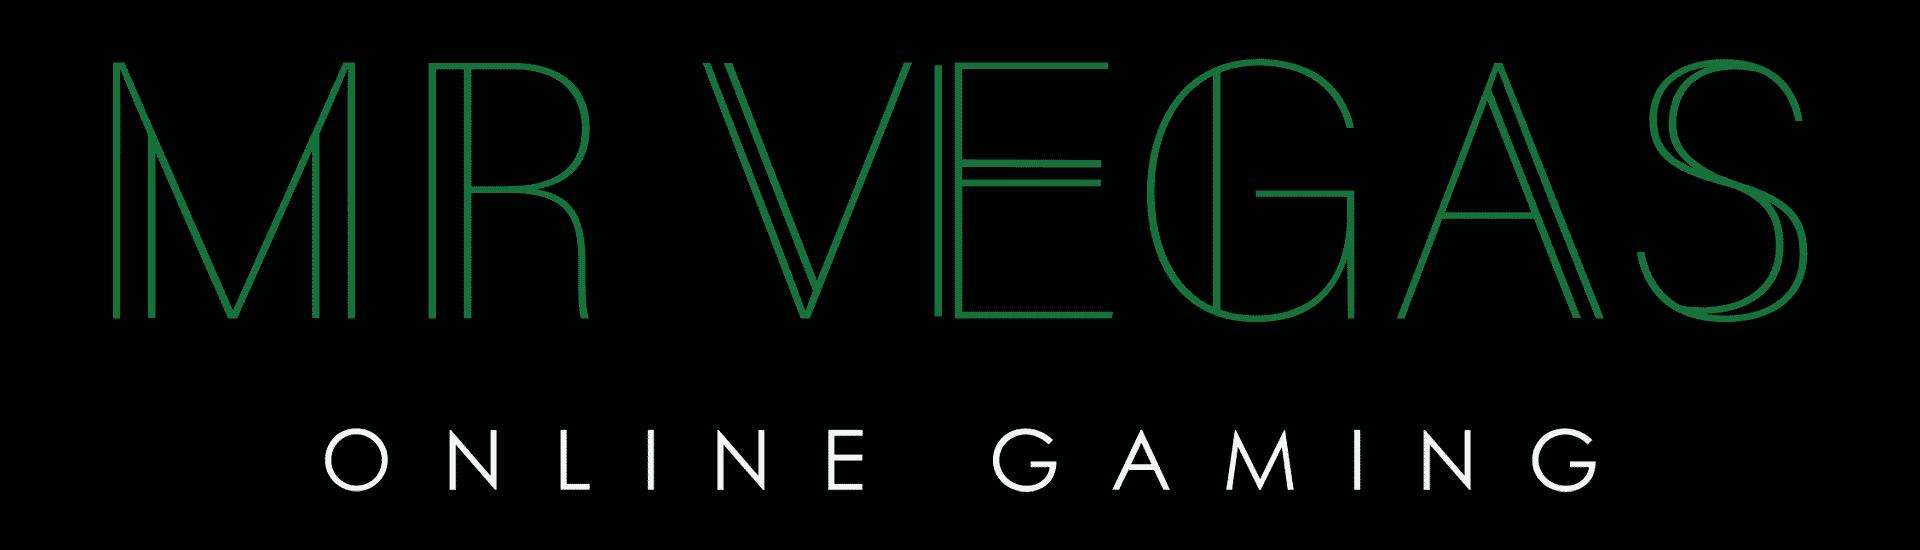 Mr Vegas Featured Image